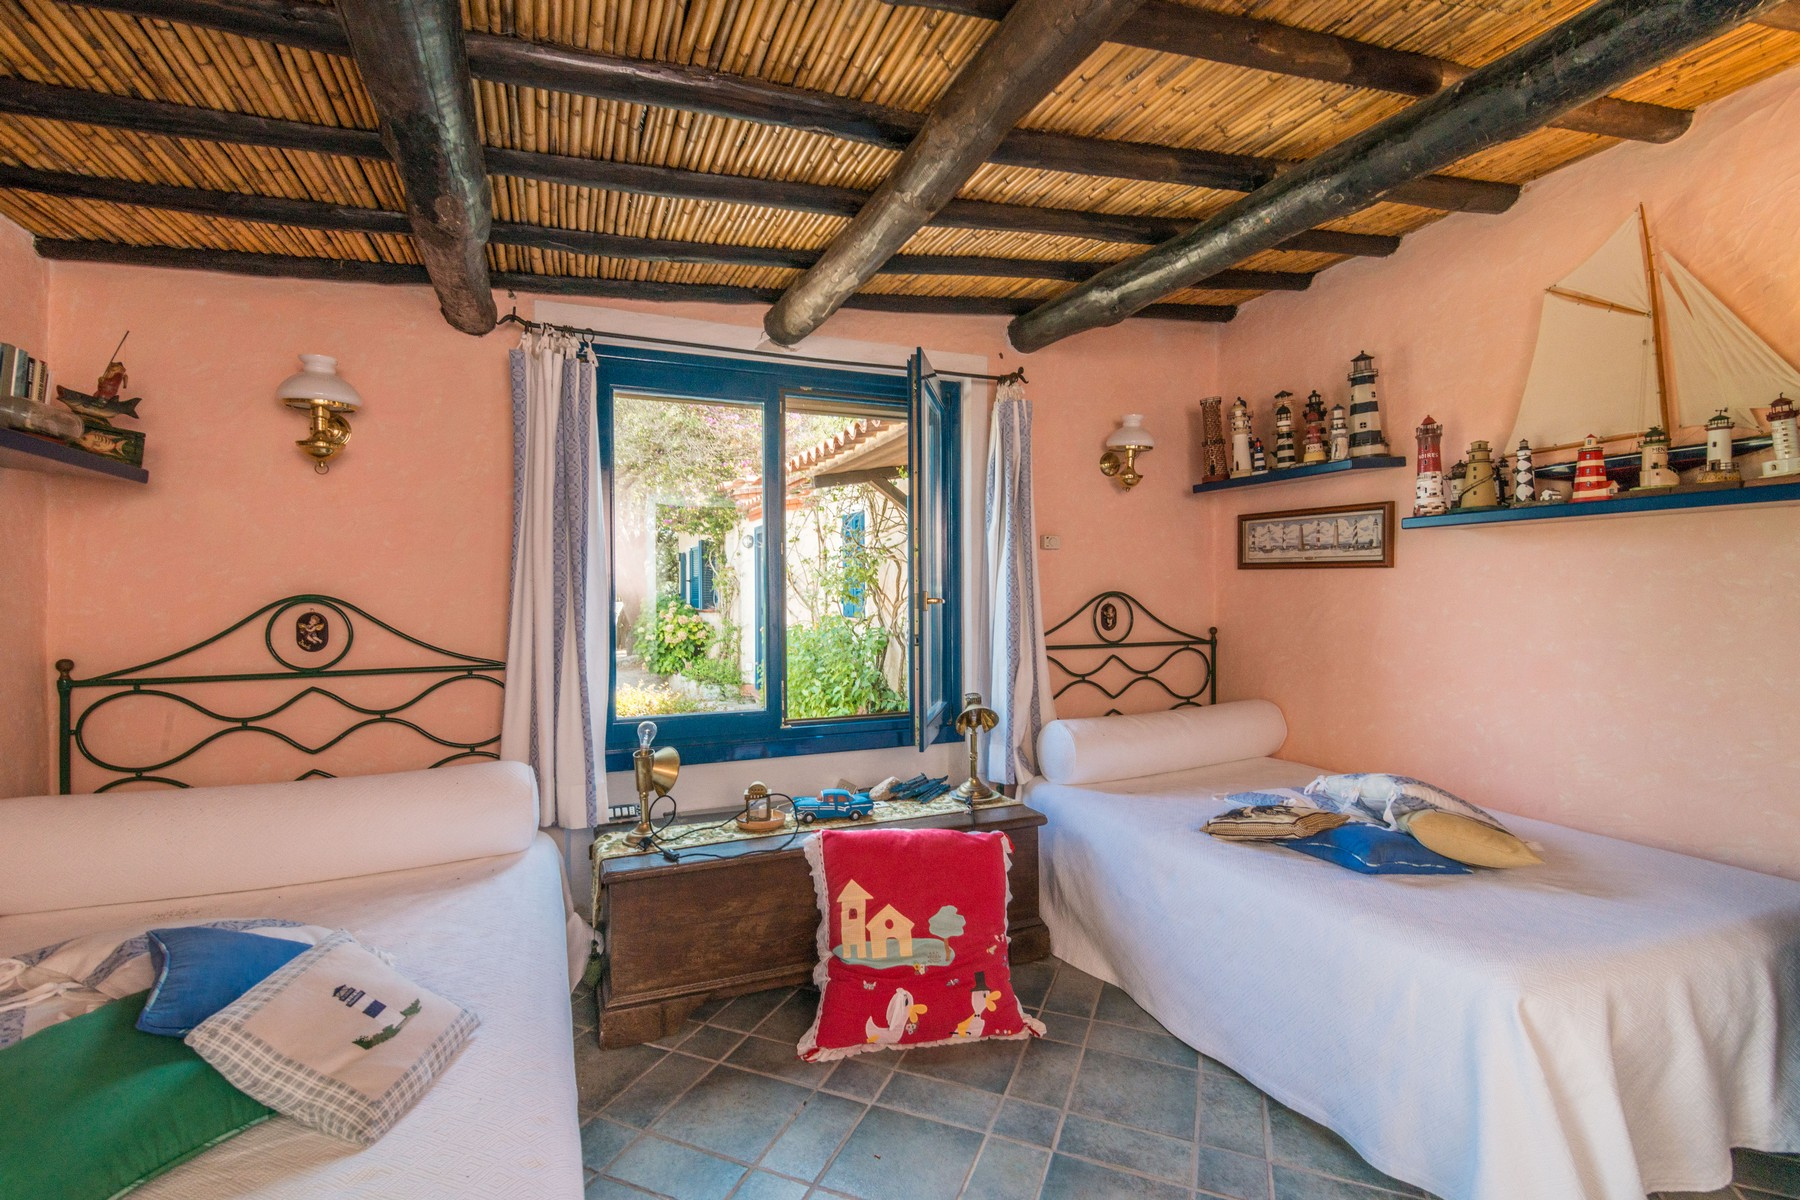 Casa indipendente in Vendita a Olbia: 5 locali, 230 mq - Foto 20